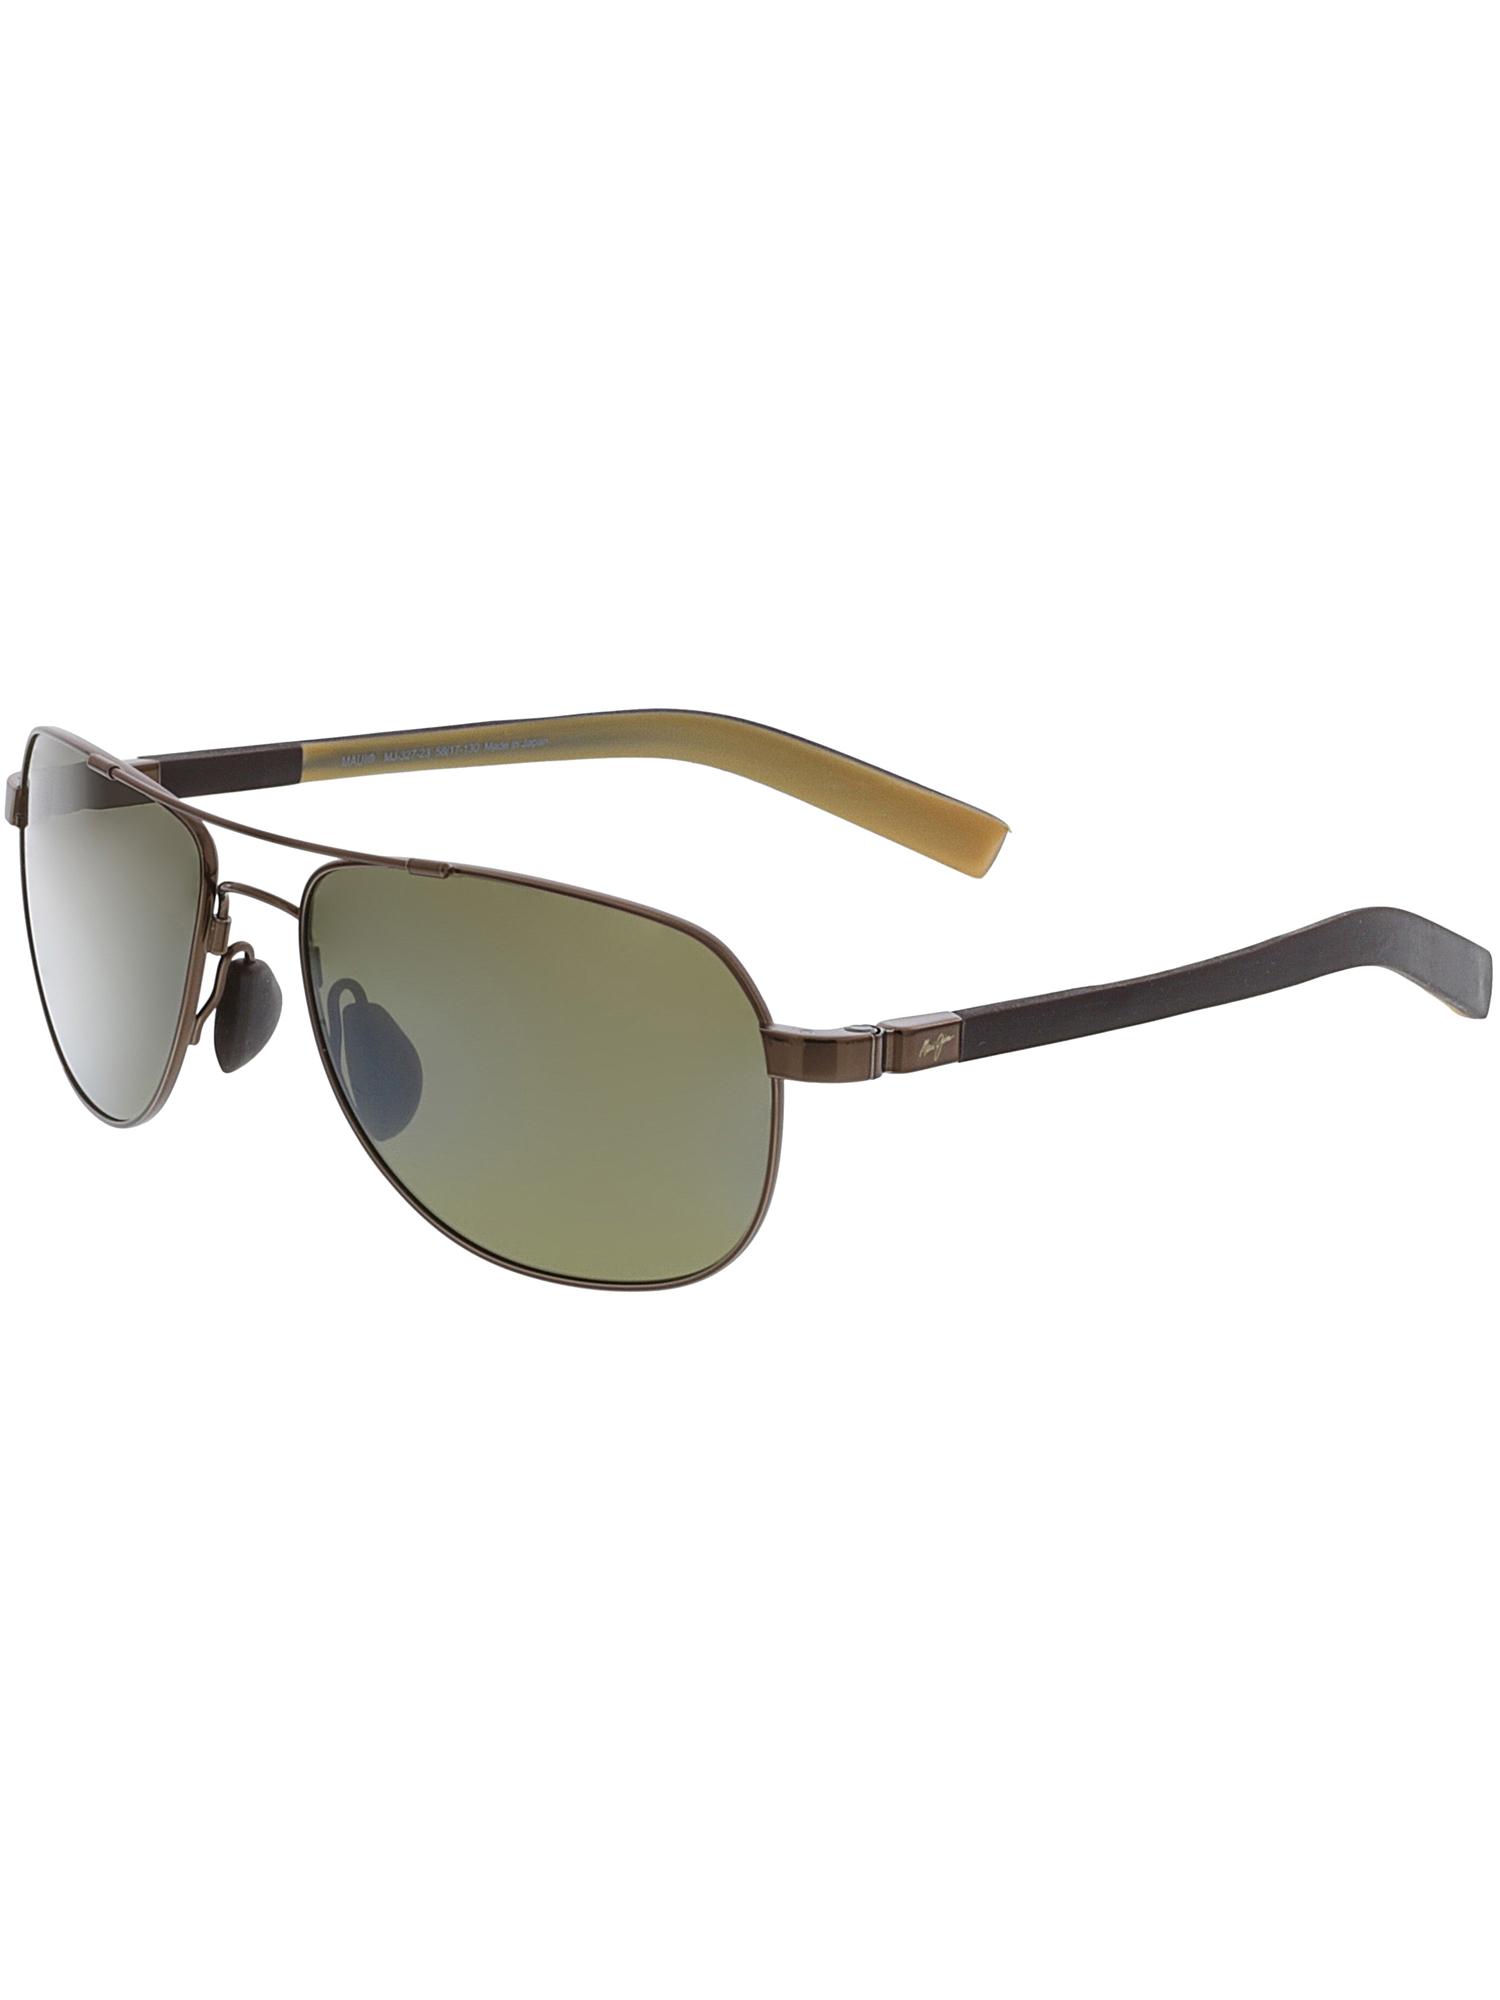 Maui Jim Sunglasses   Guardrails 327   Aviator Frame, Polarized Lenses, with Patented PolarizedPlus2 Lens Technology